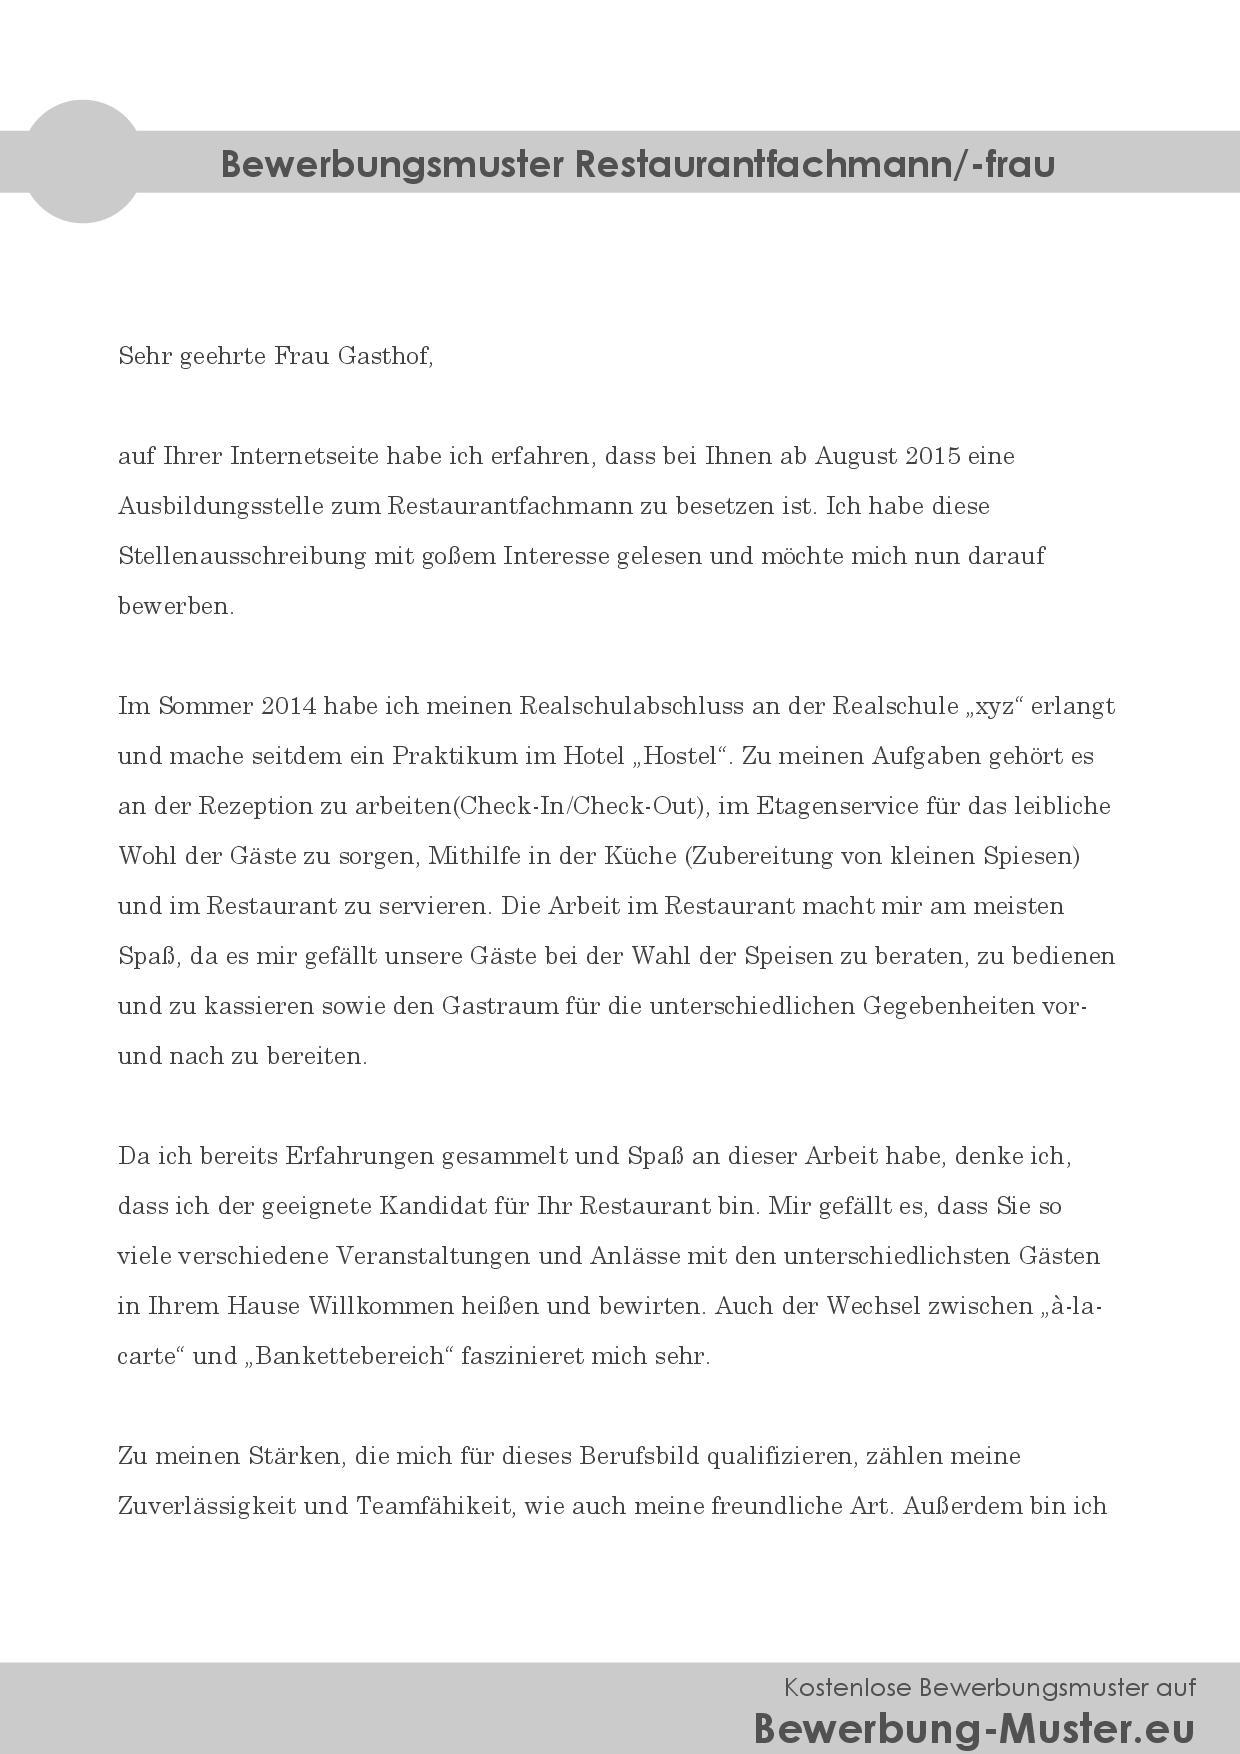 Gratis Bewerbungsmuster   Restaurantfachmann/ frau